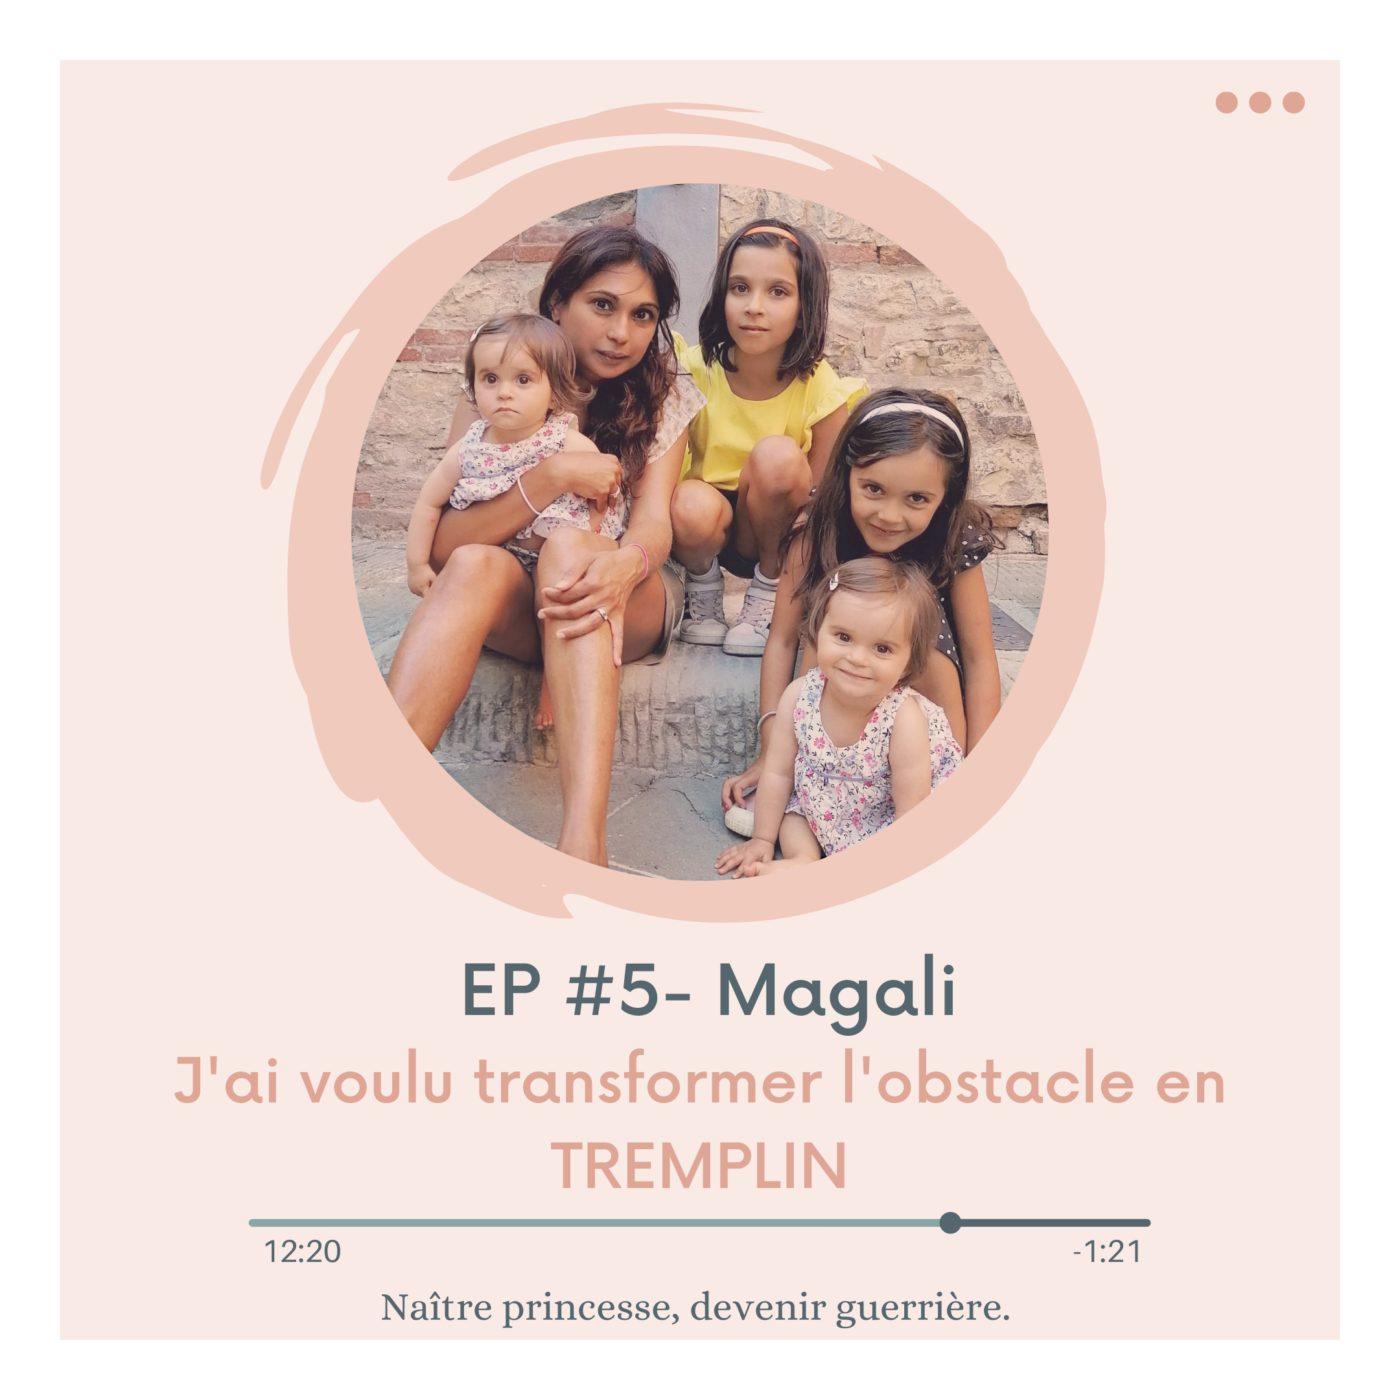 EP#5 - J'AI VOULU TRANSFORMER L'OBSTACLE EN TREMPLIN. MAGALI.